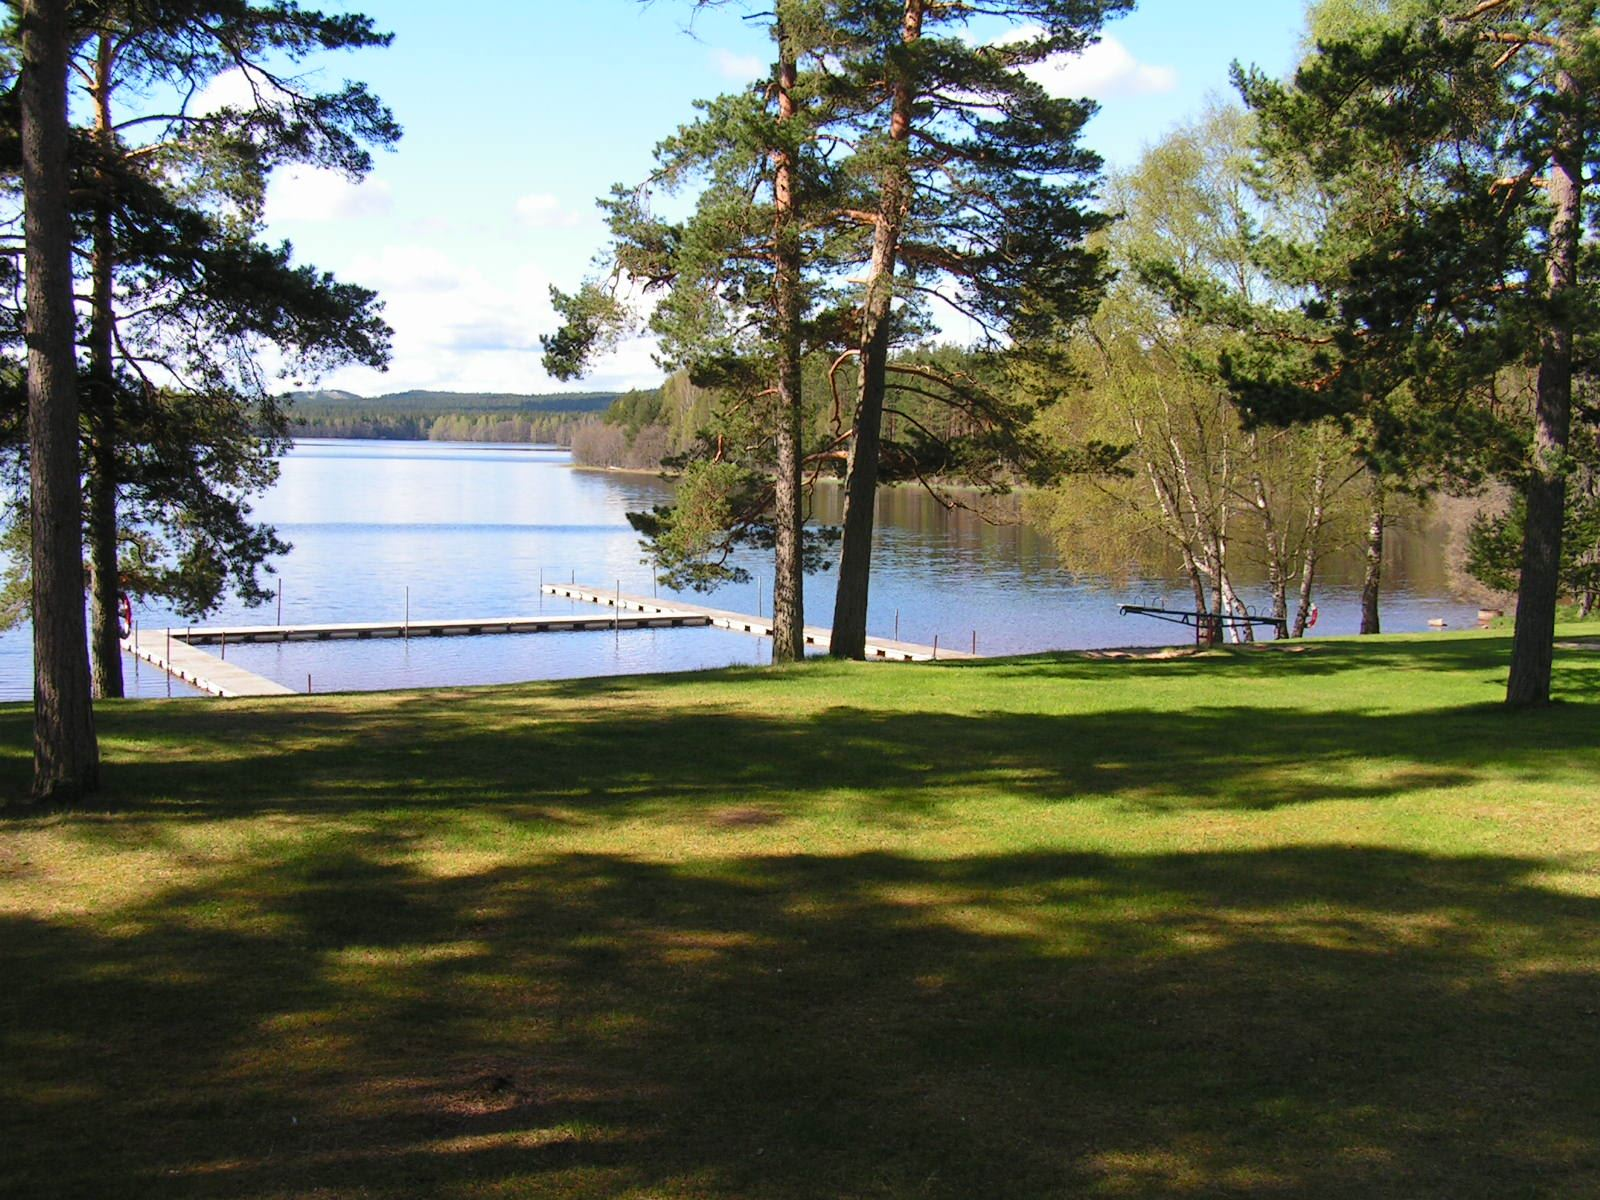 © Gislaveds kommun, Örerydsbadet (Norra Hestra)